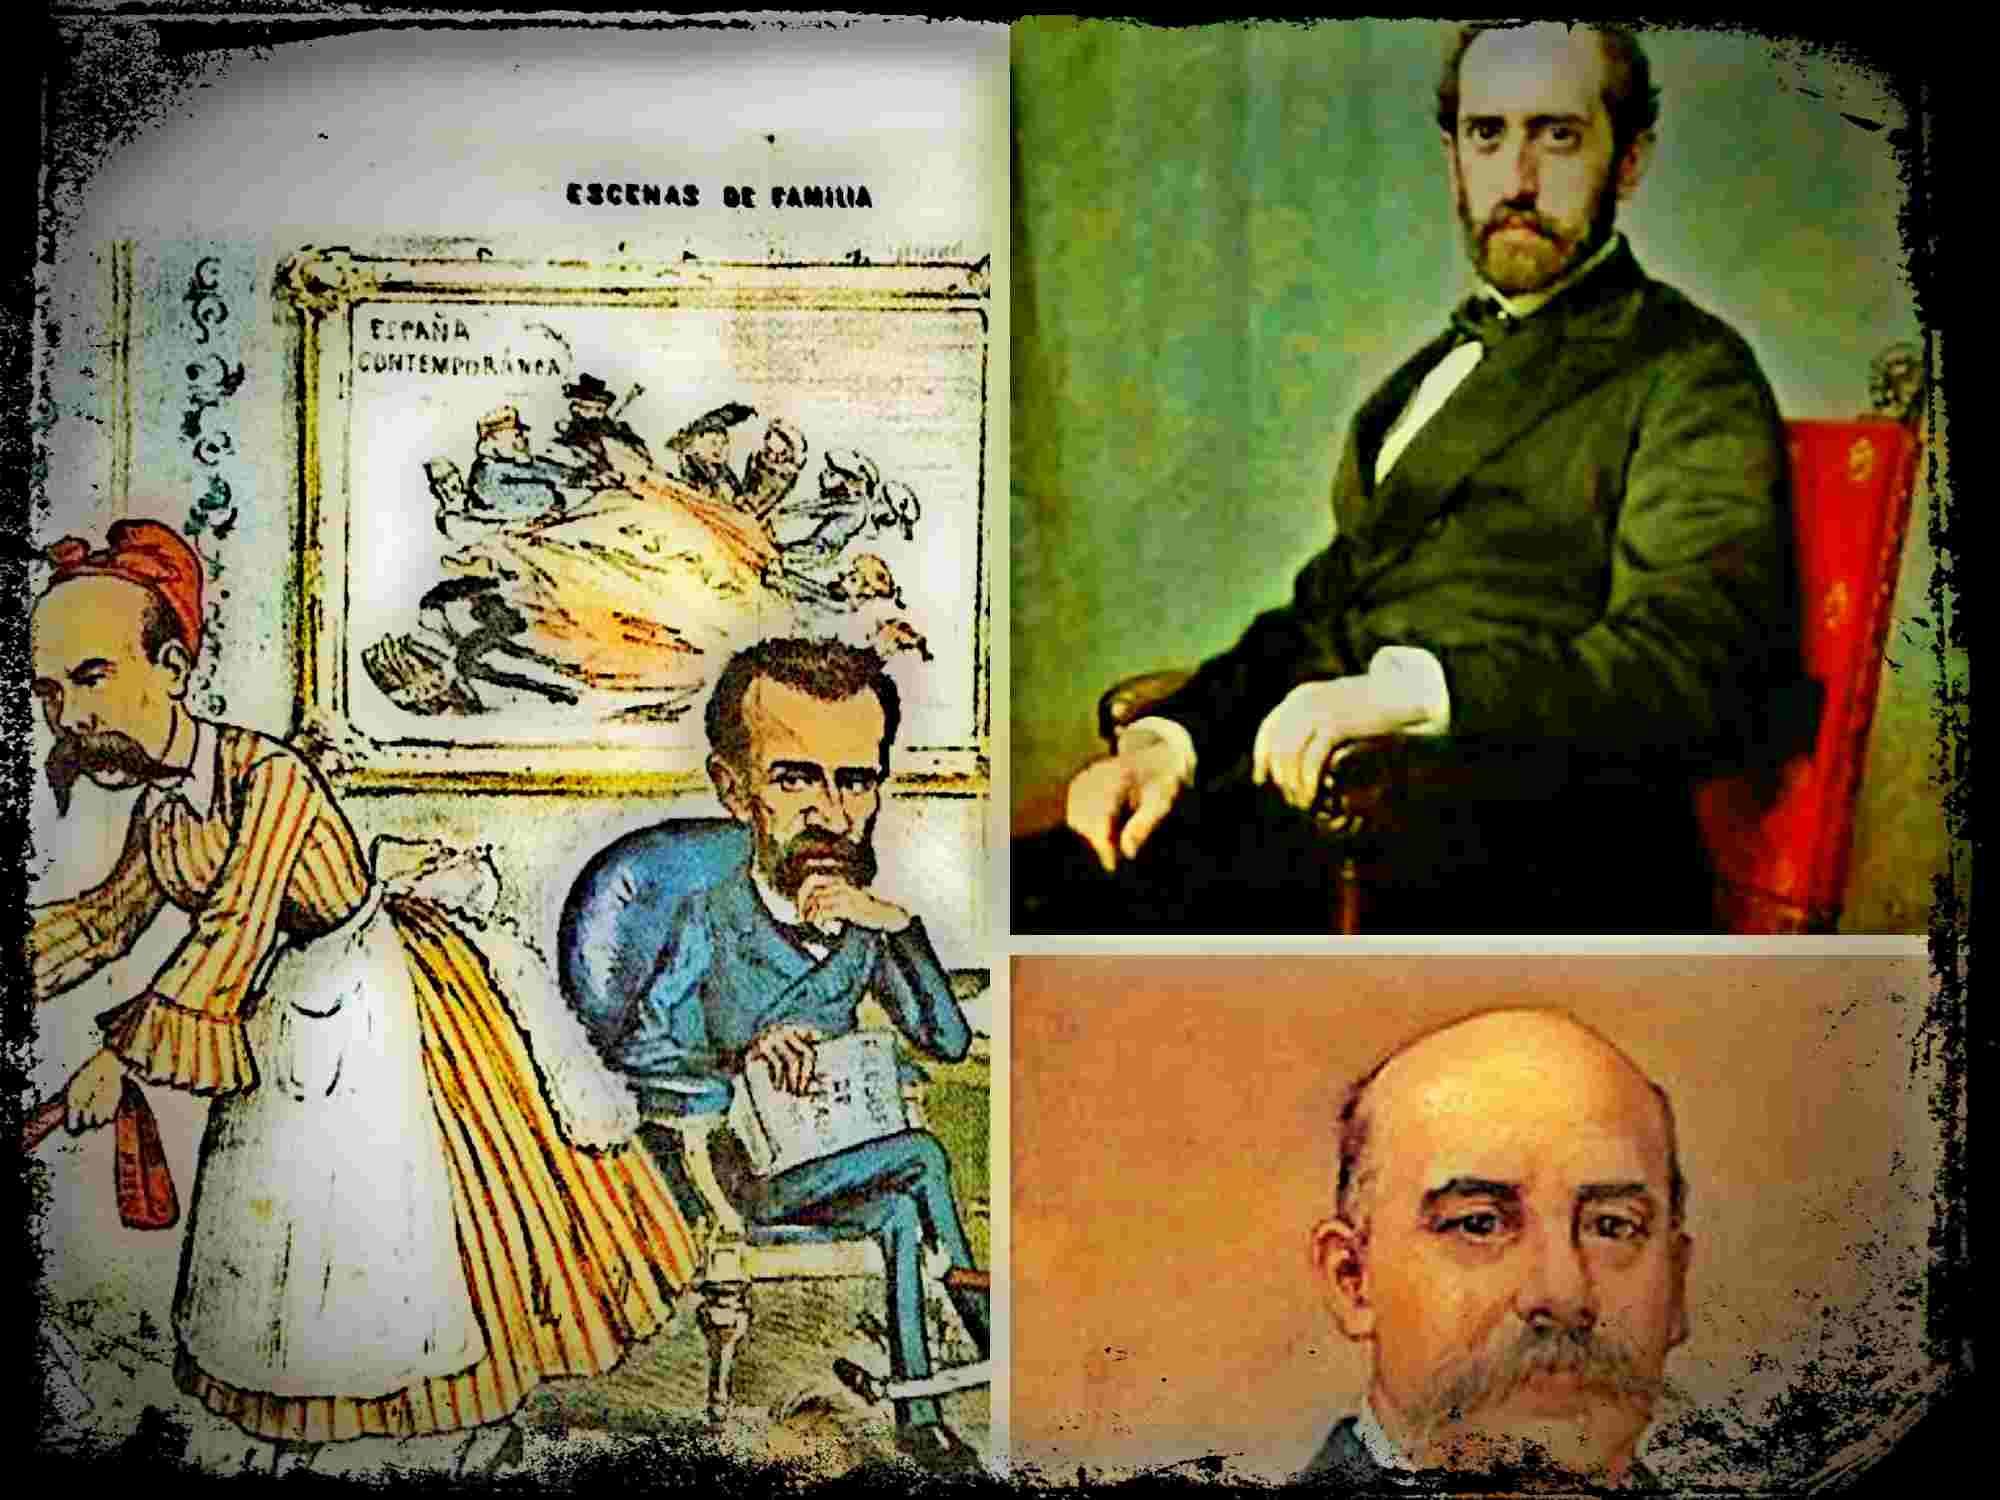 Salmerón y Castelar